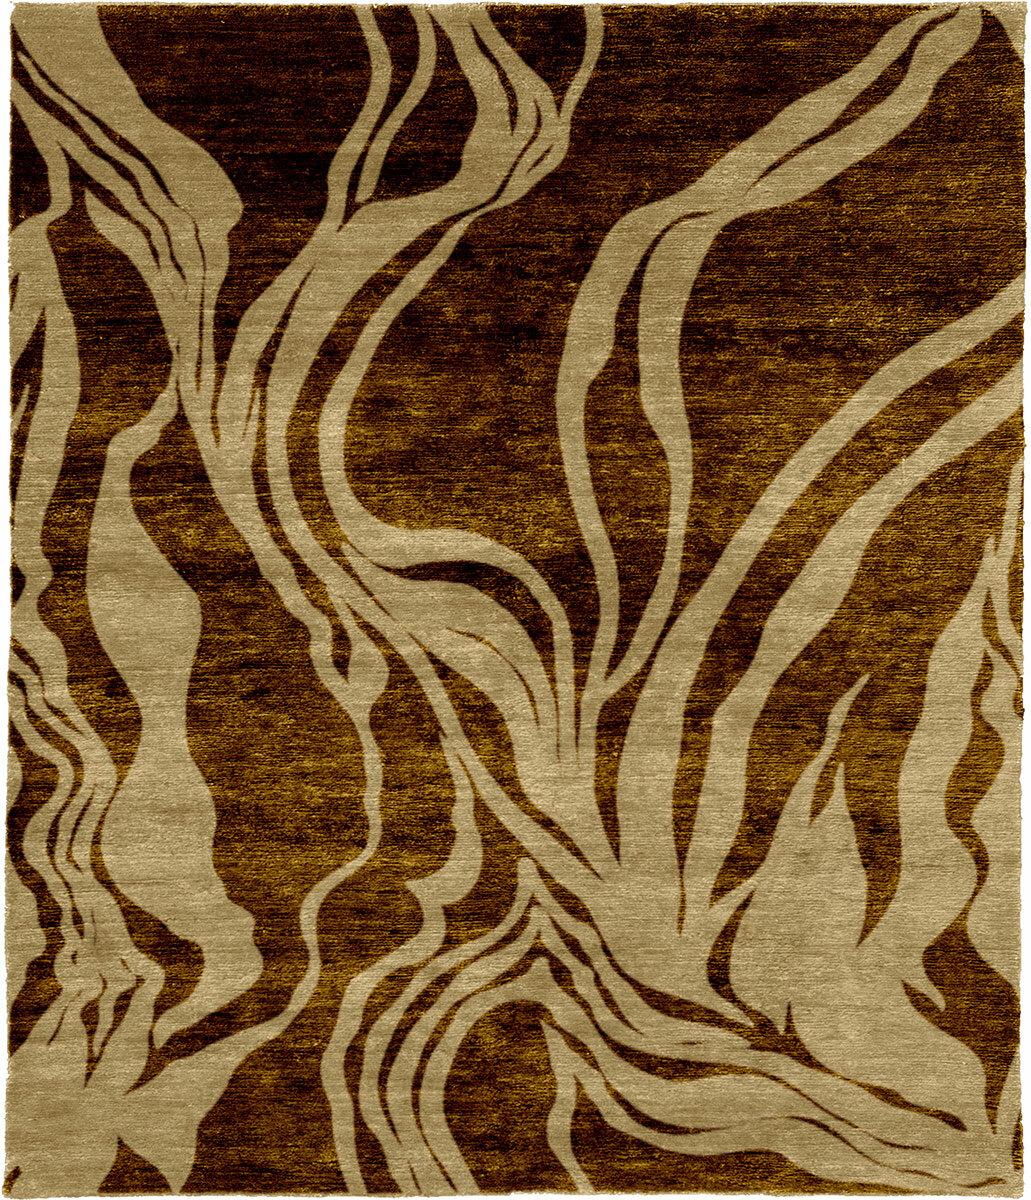 Brayden Studio One Of A Kind Eldora Hand Knotted Brown 8 X 10 Wool Area Rug Wayfair